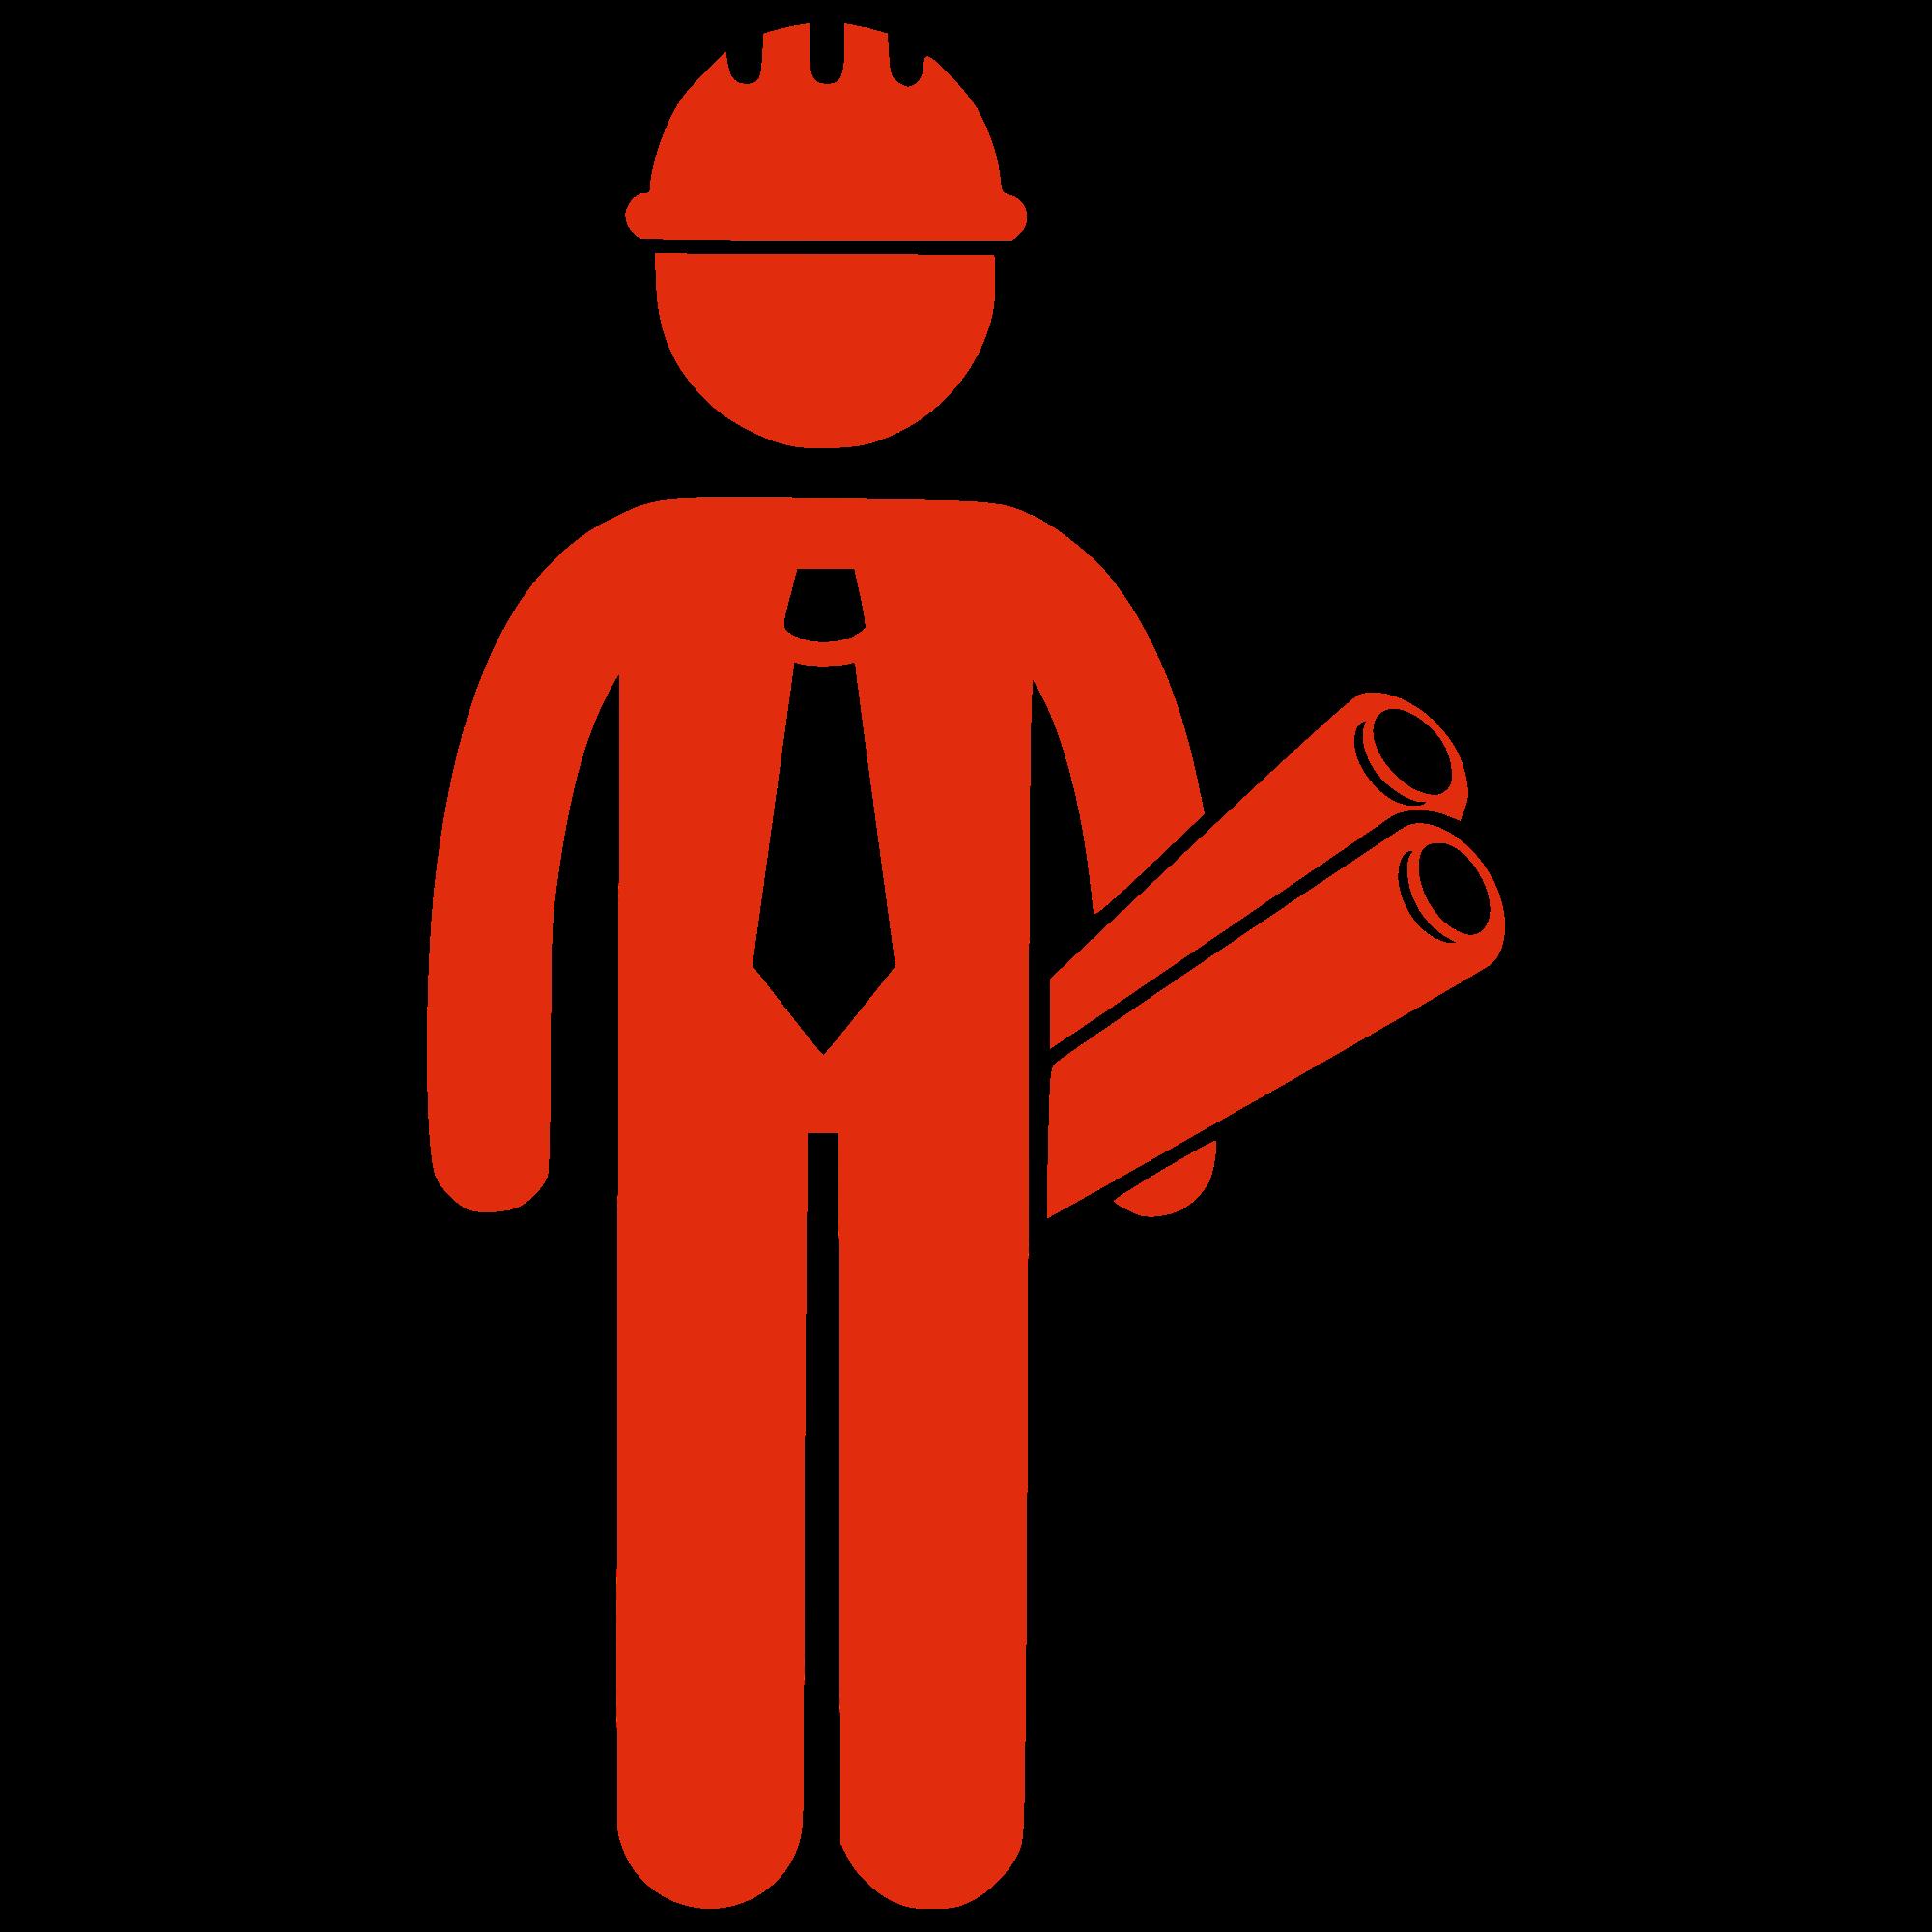 Contractor silhouette